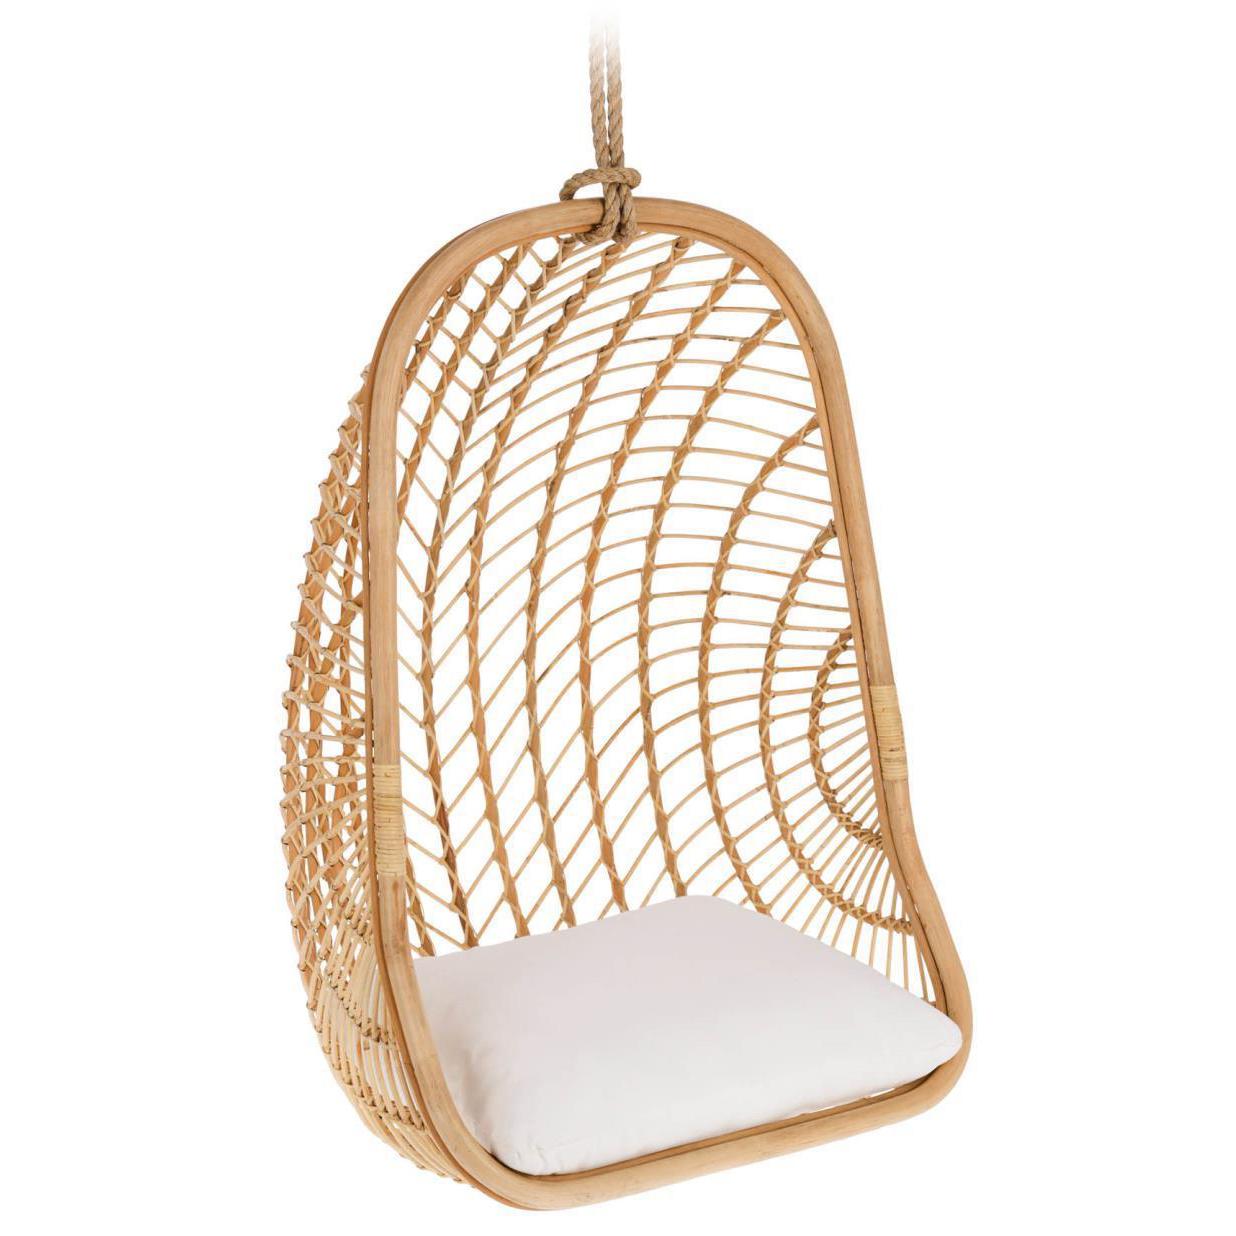 Cadeira suspensa Katerin, rattan natural, 85x124